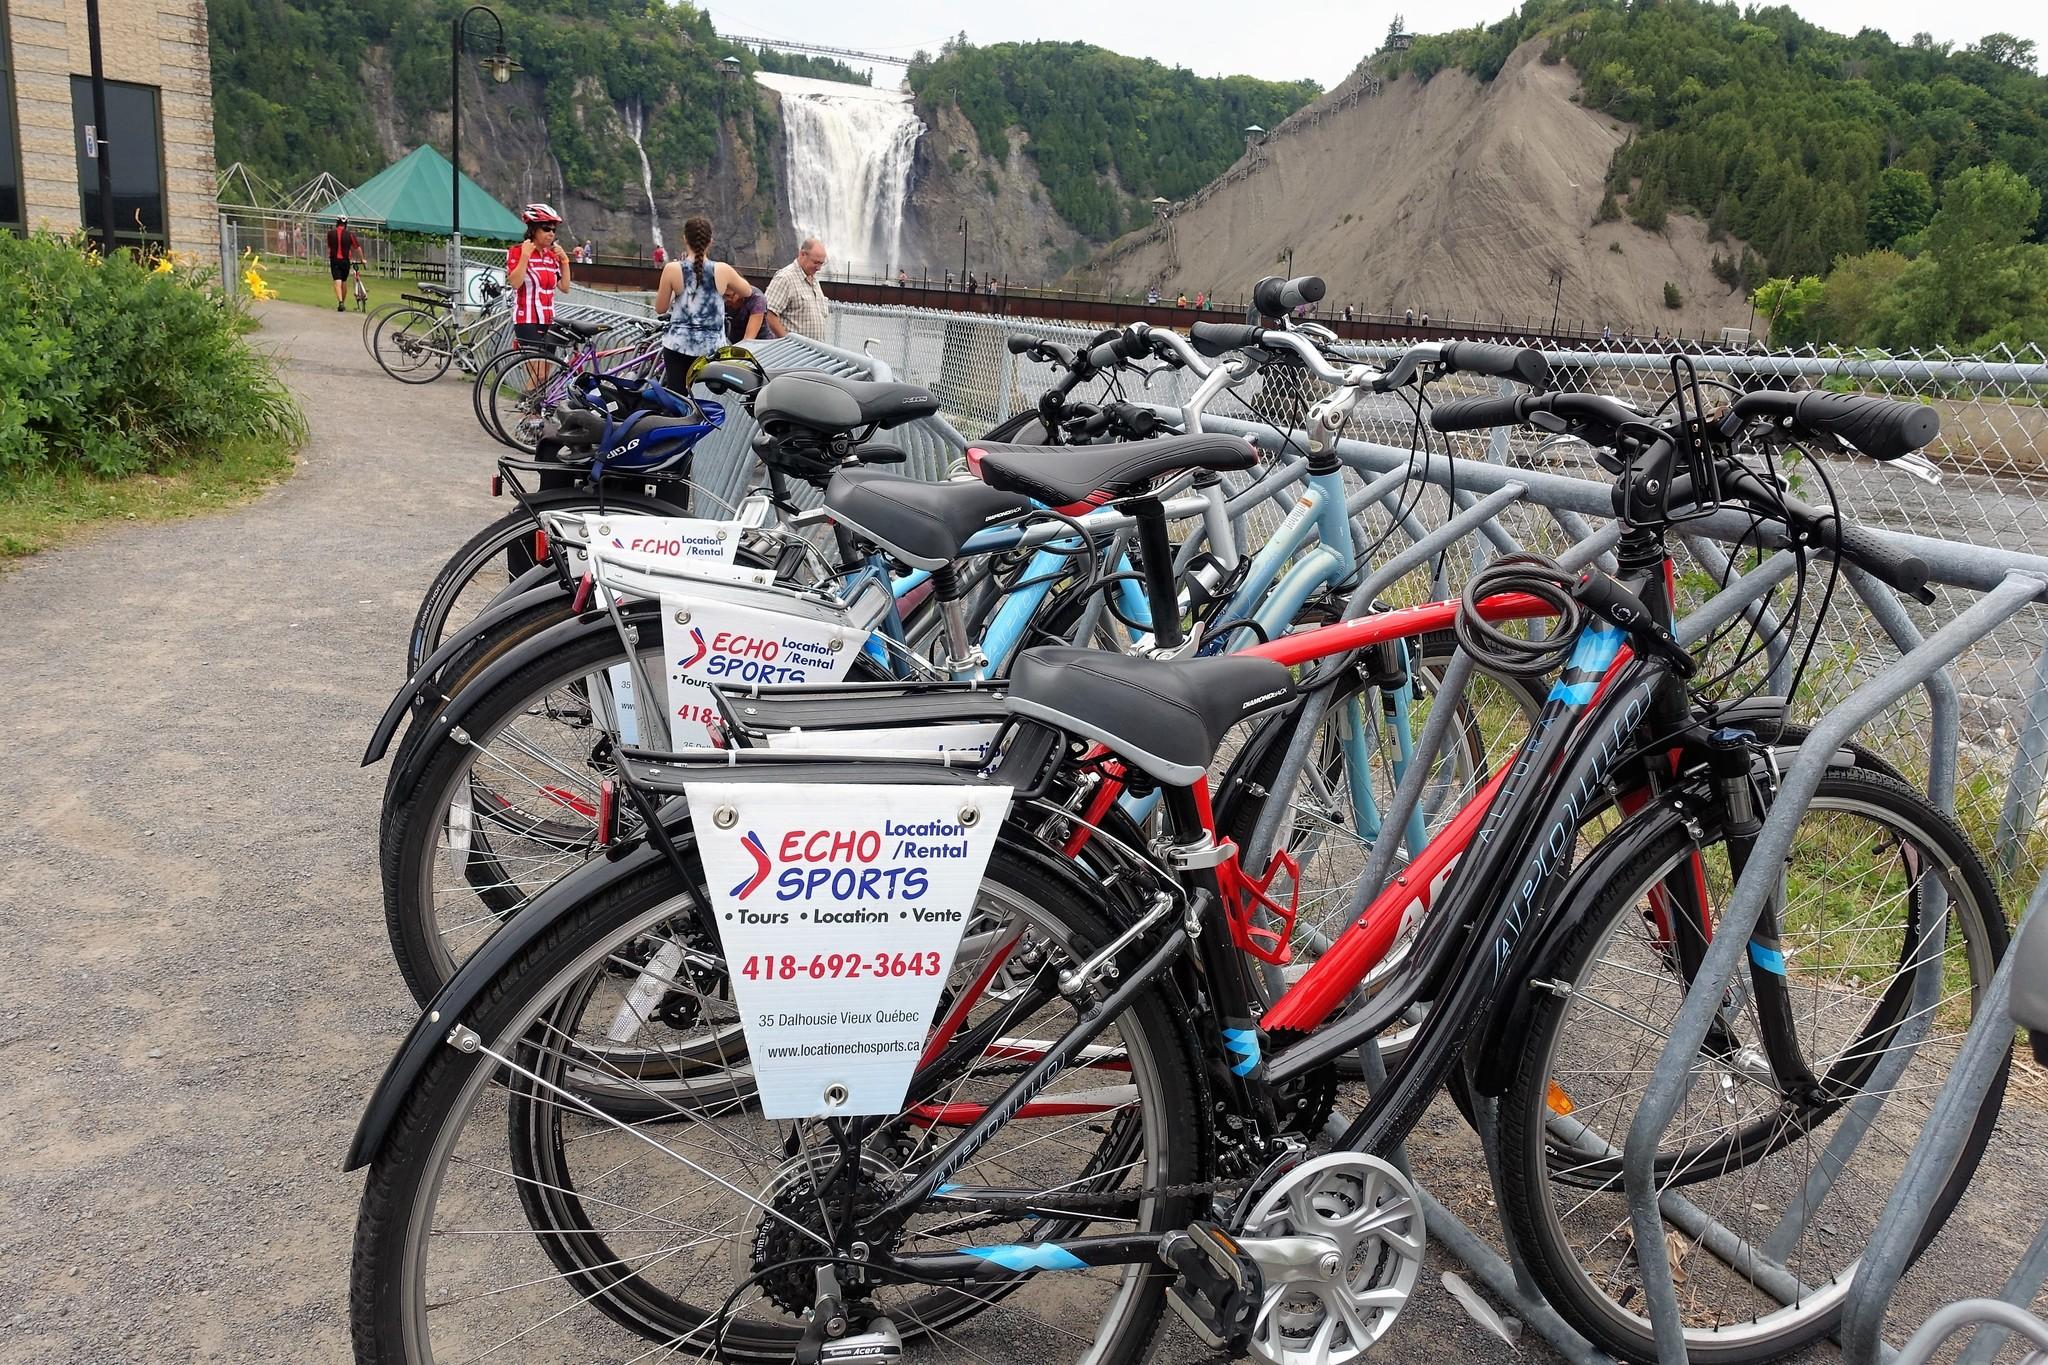 Majestic Montmorency falls electric bike tour, 80$